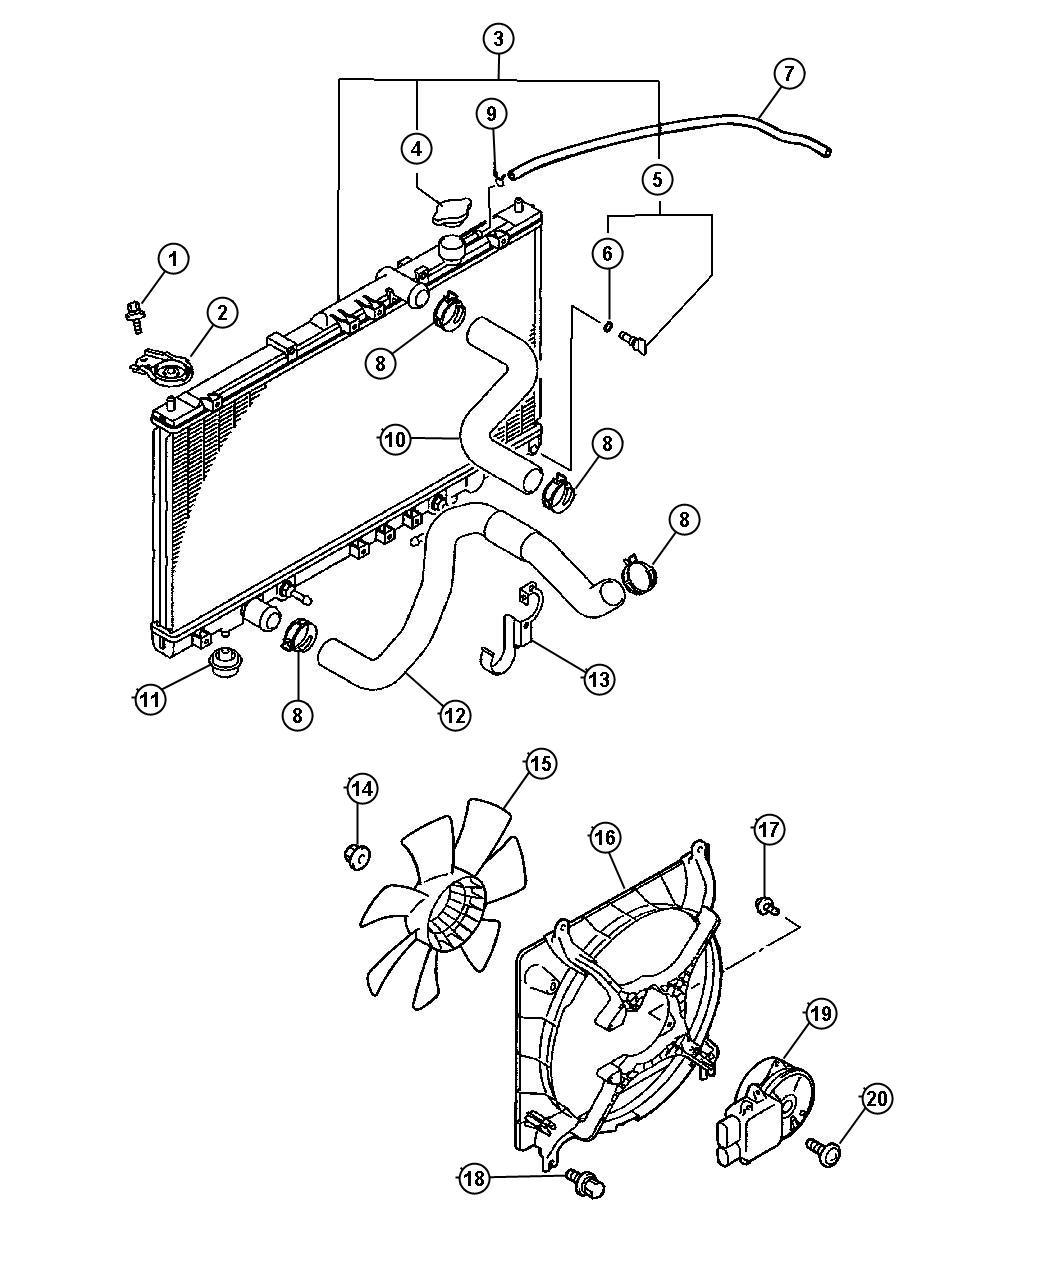 [DIAGRAM] 2002 Sebring Engine Diagram Radiator FULL